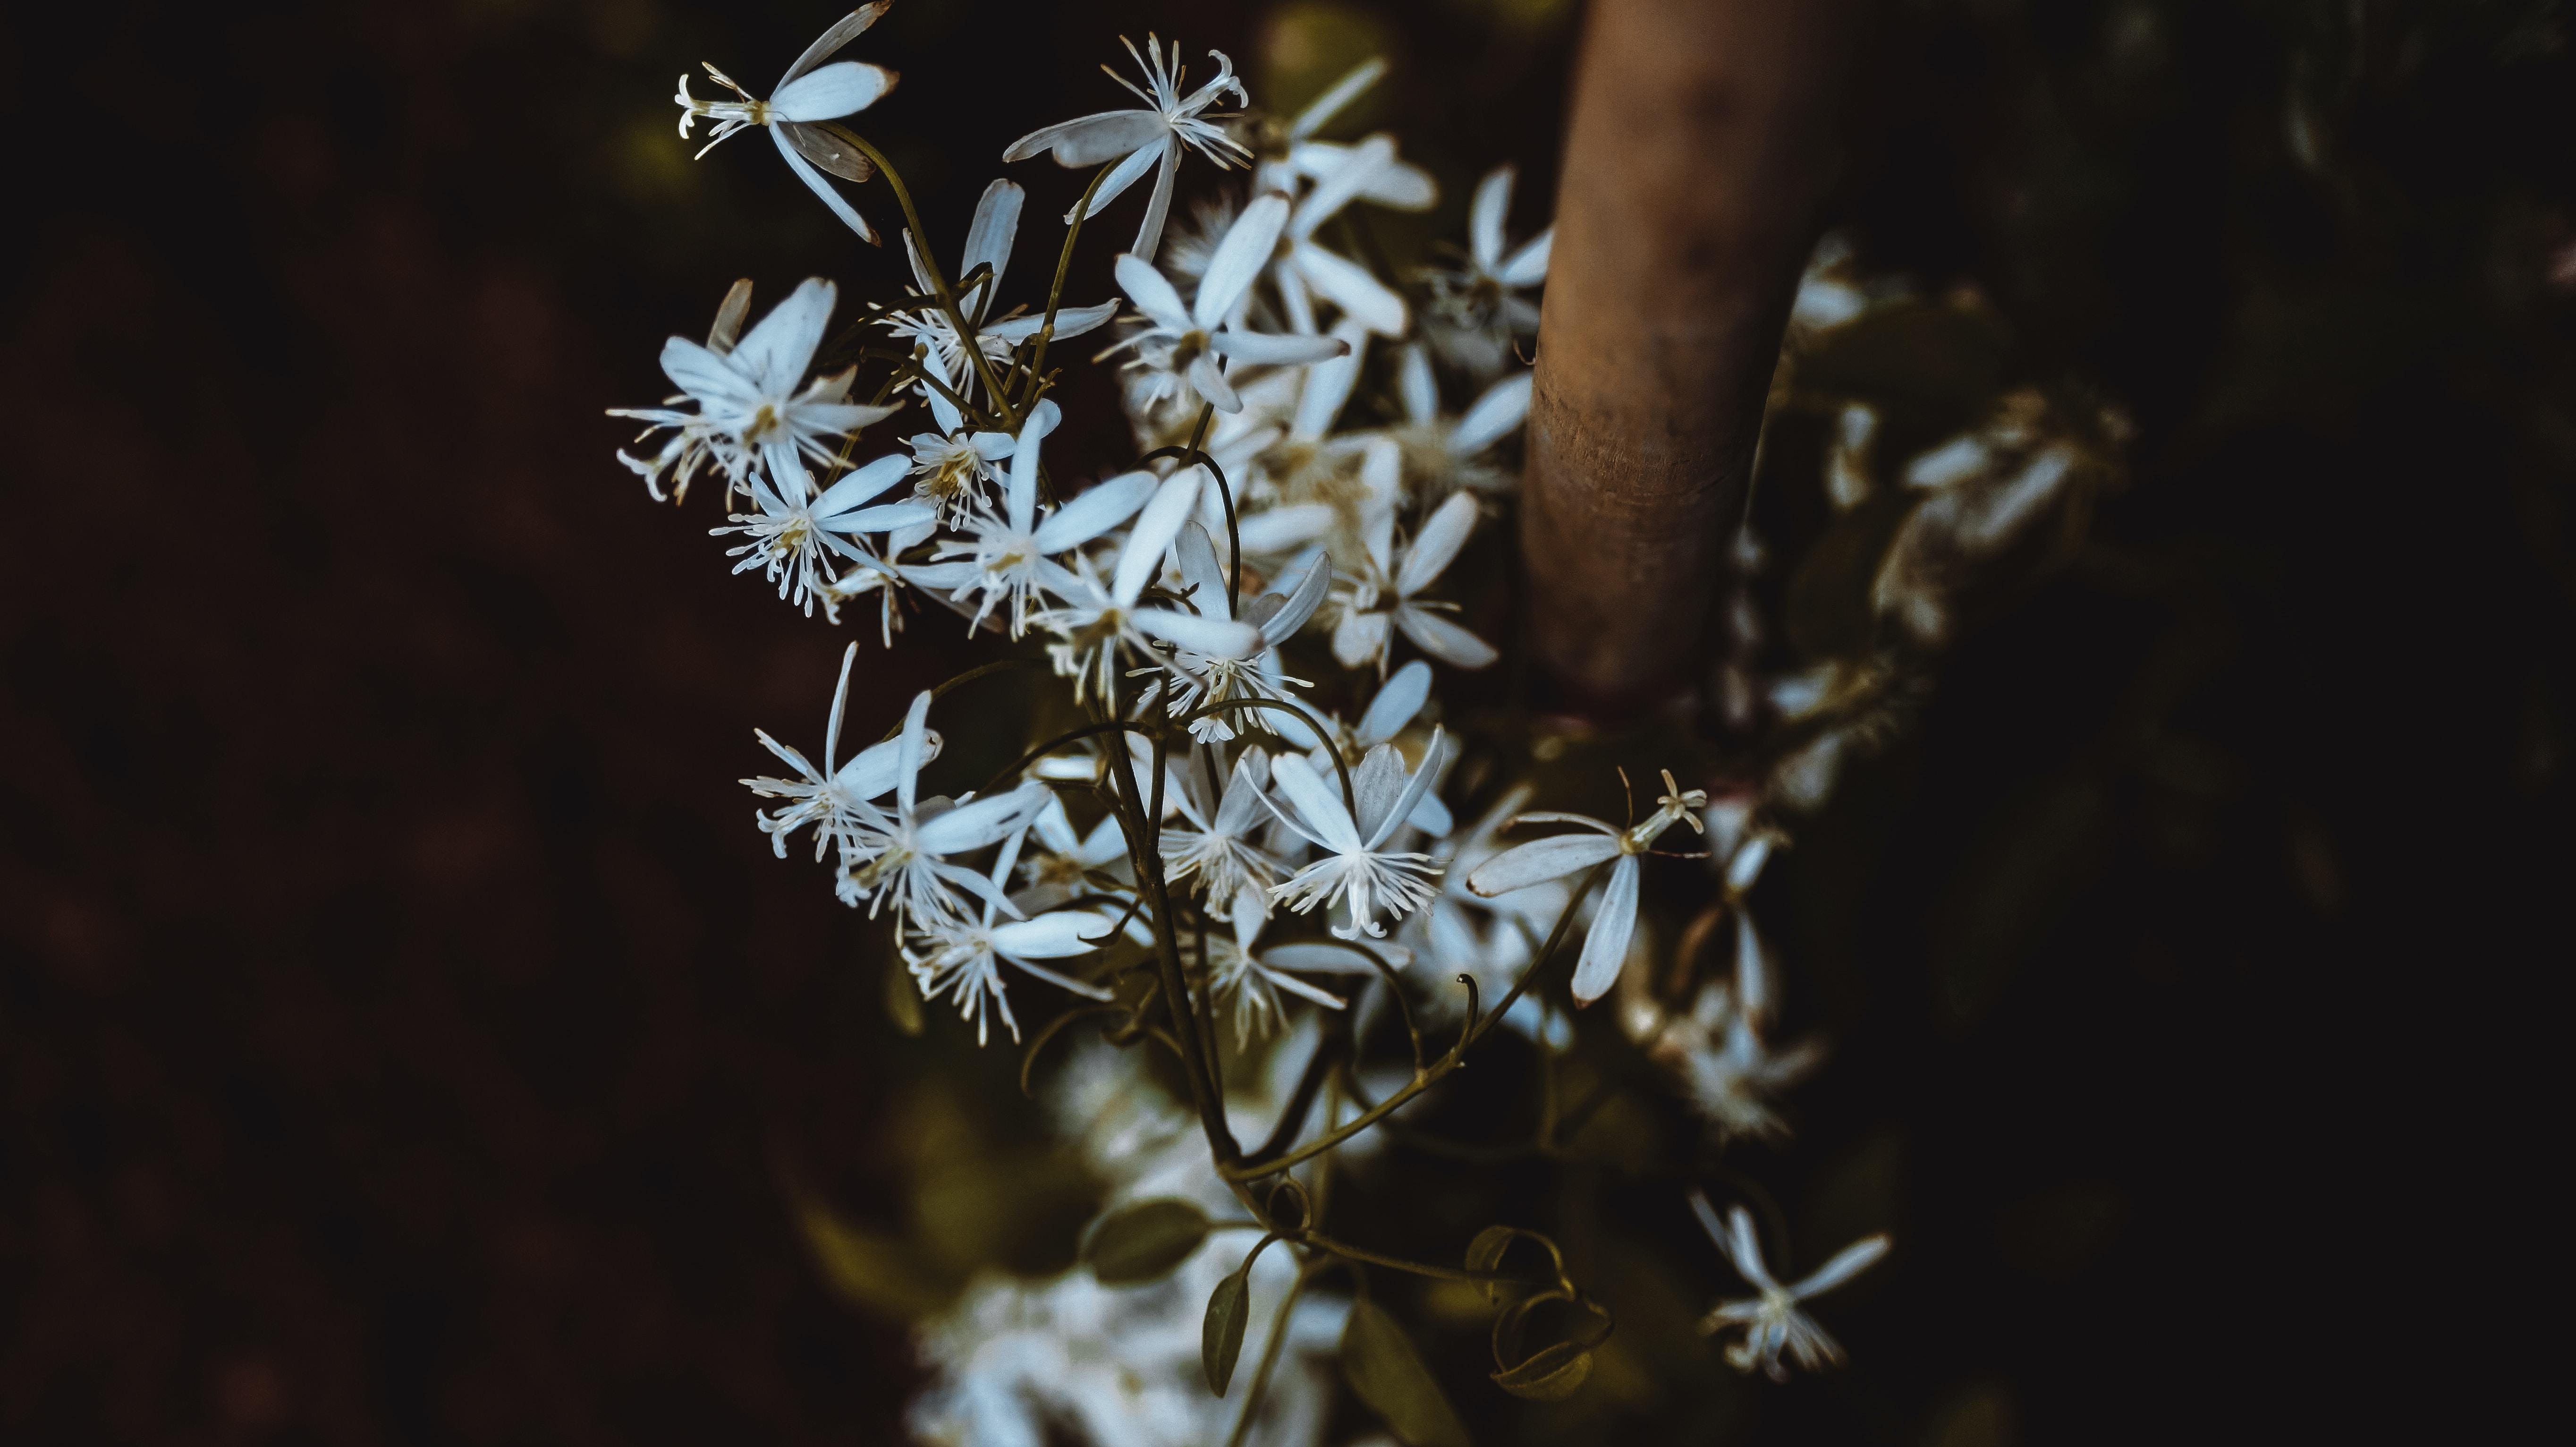 White wildflowers in a dark natural landscape